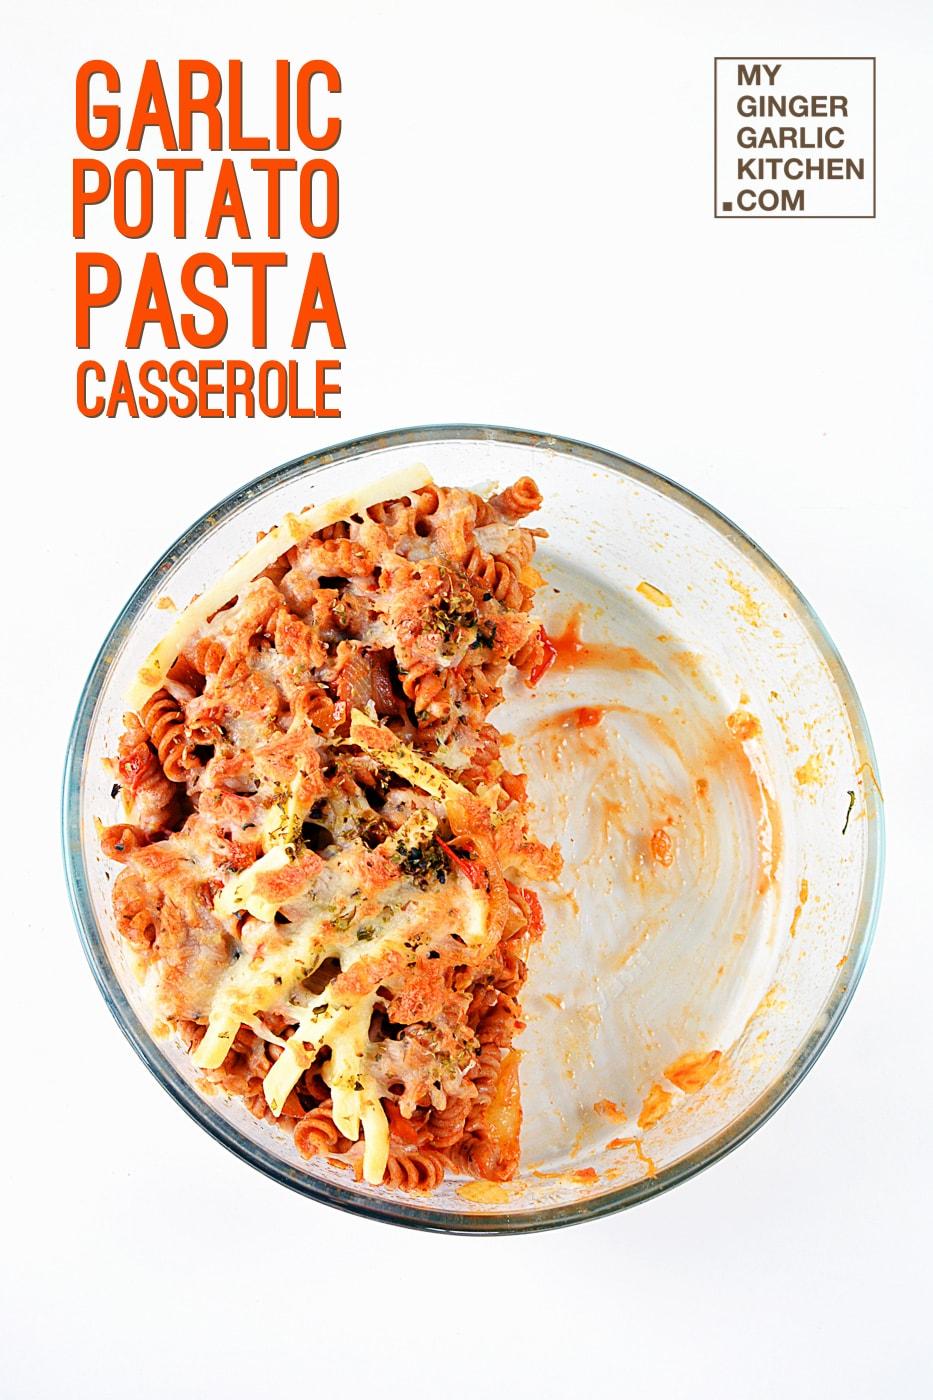 recipe-garlic-potato-pasta-casserole-anupama-paliwal-my-ginger-garlic-kitchen-9 copy